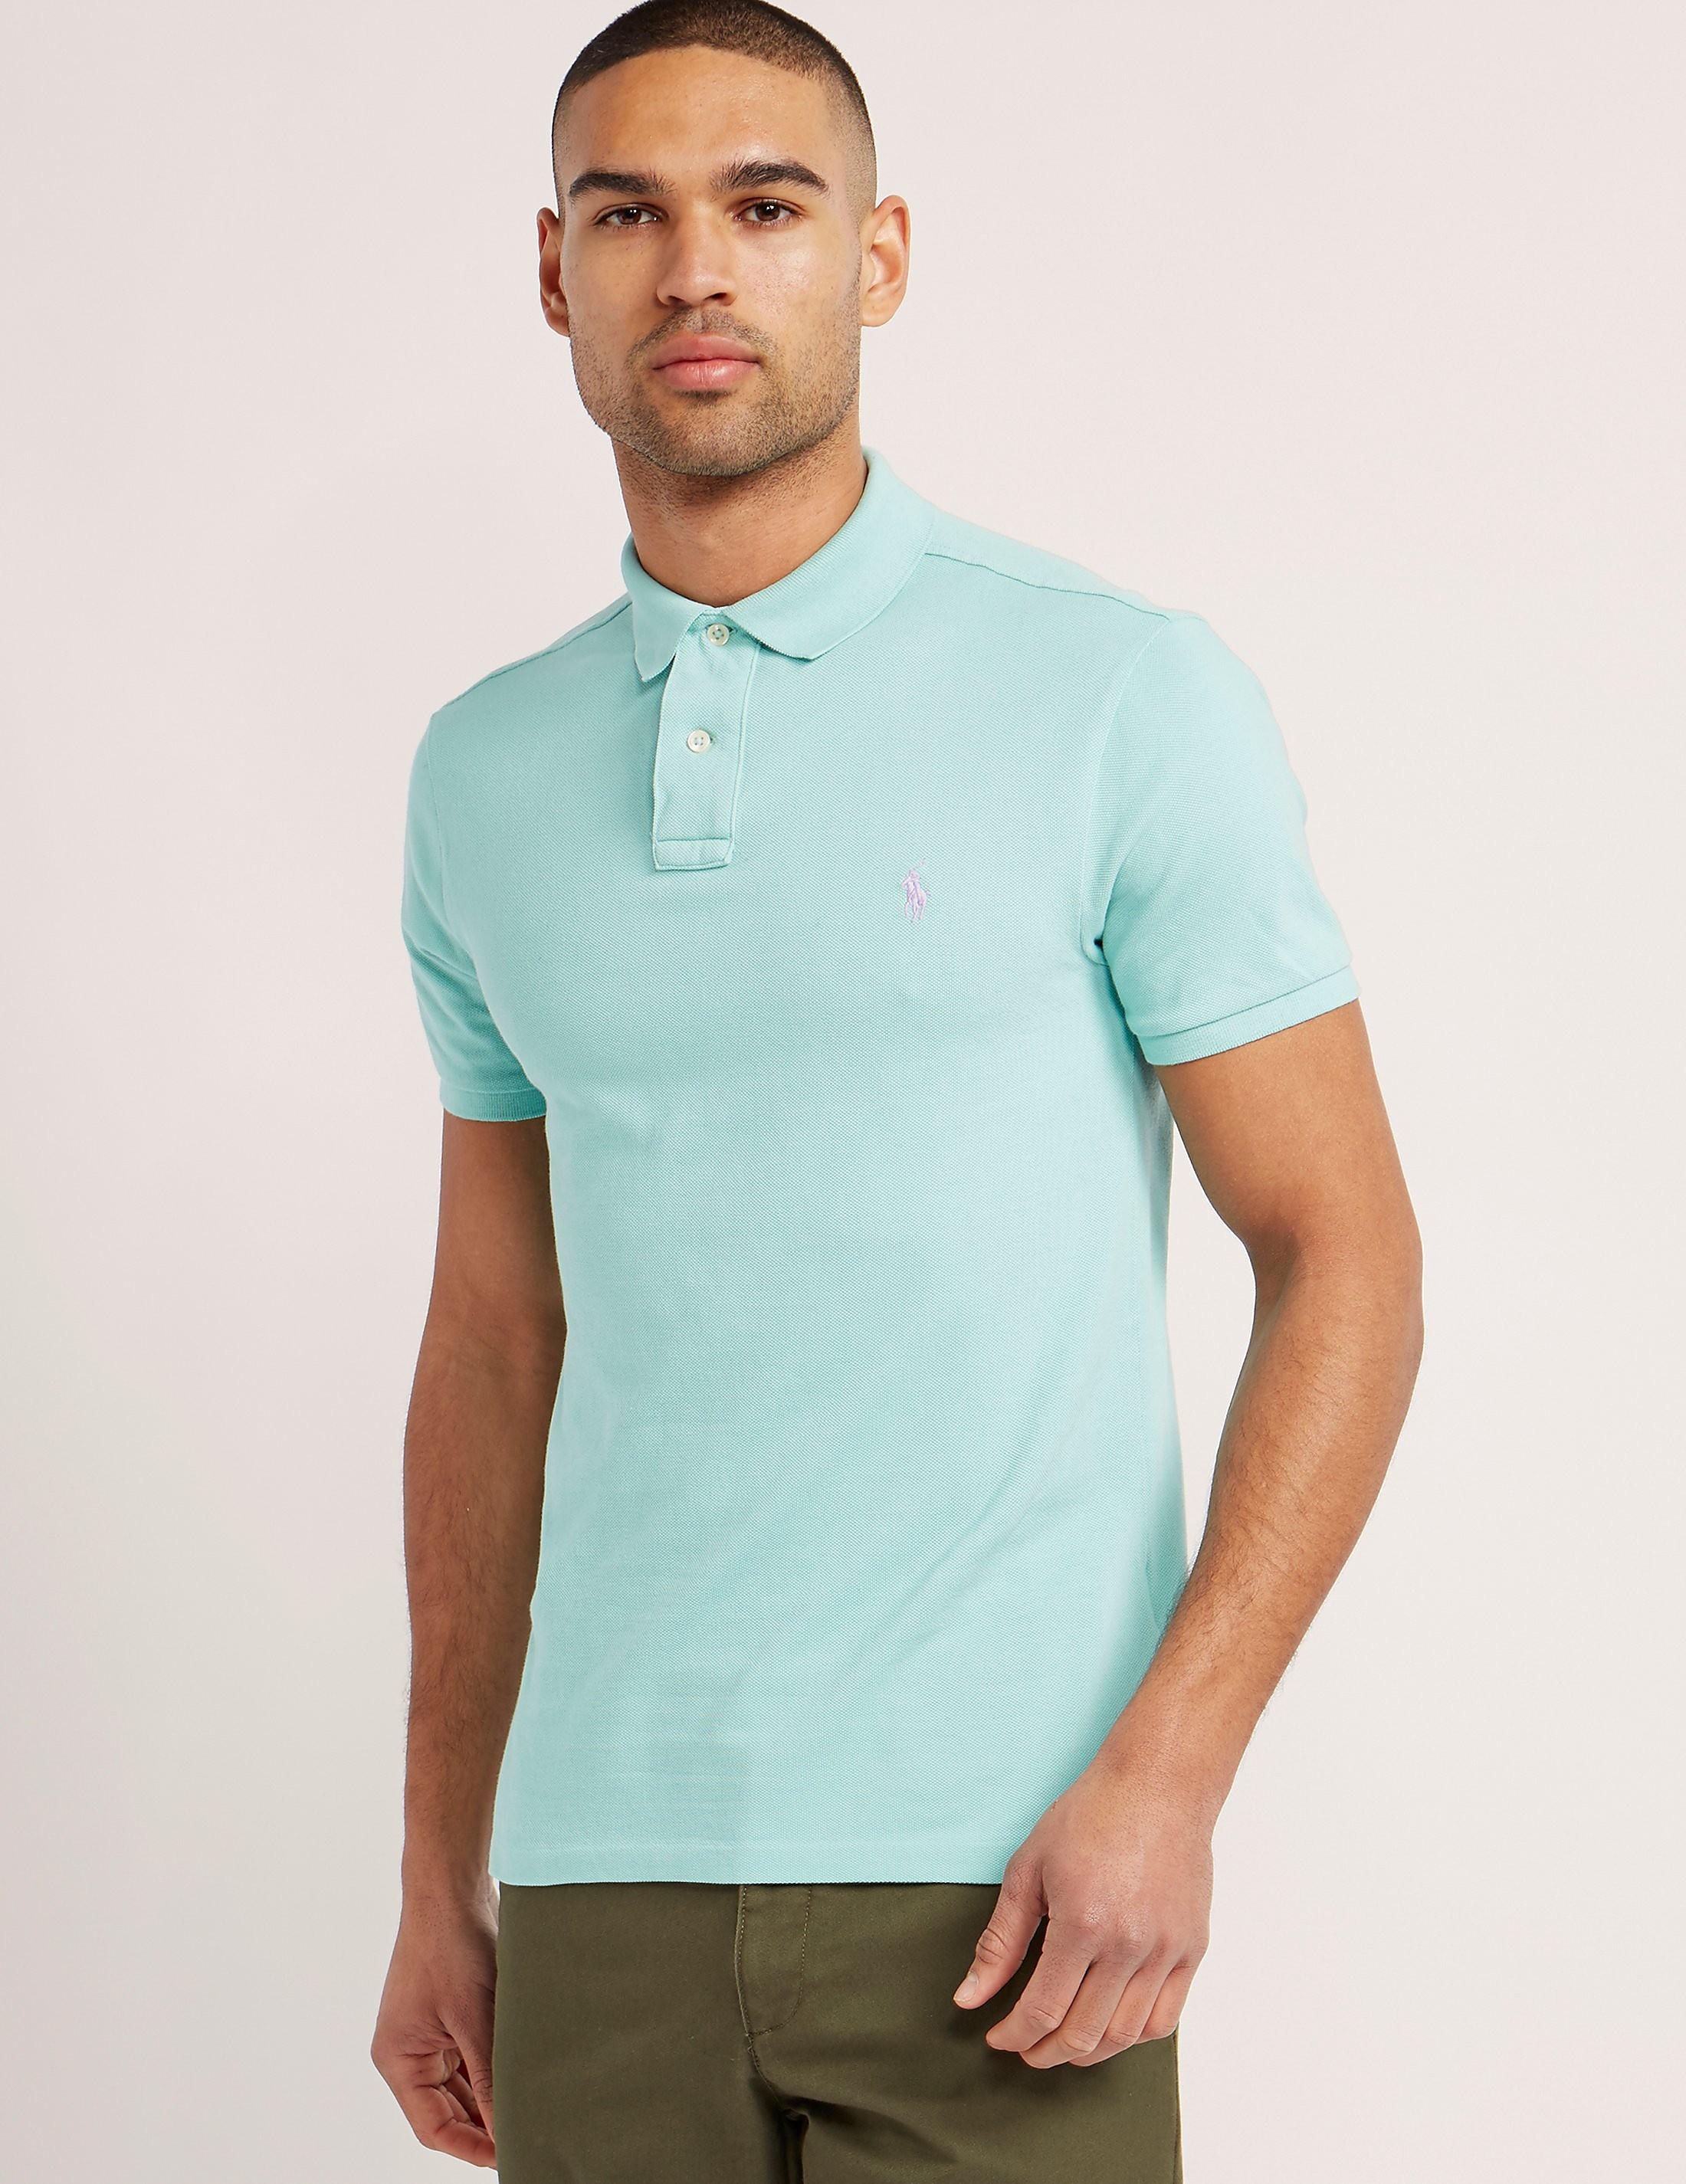 Polo Ralph Lauren Weathered Mesh Polo Shirt